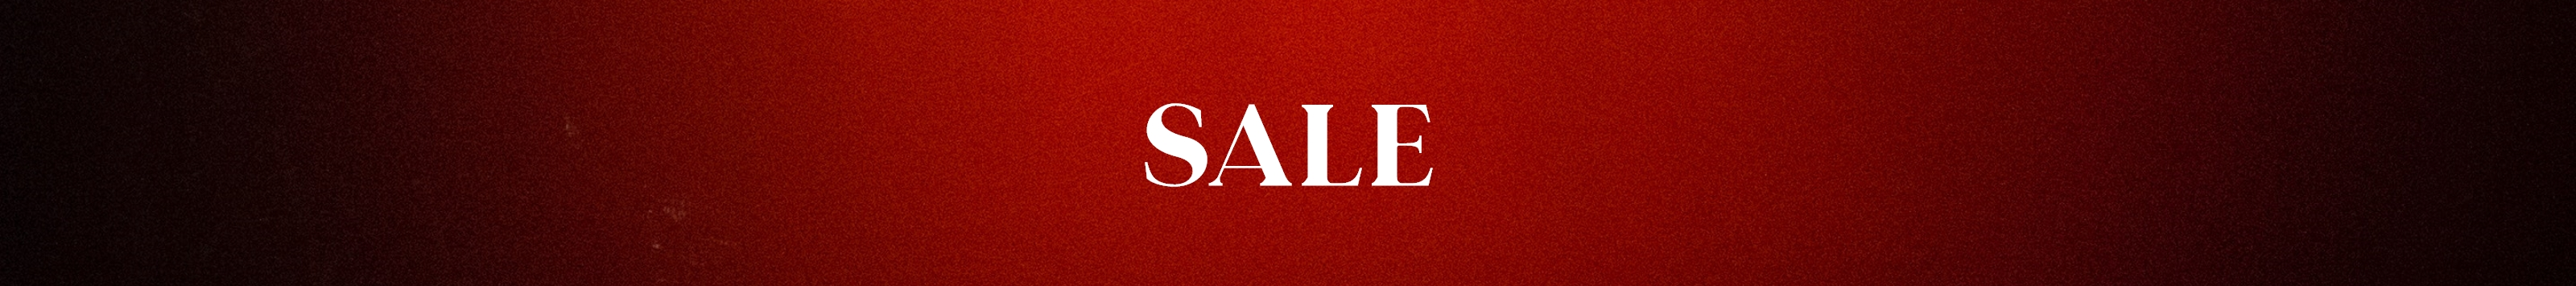 banner-category-sale2.jpg